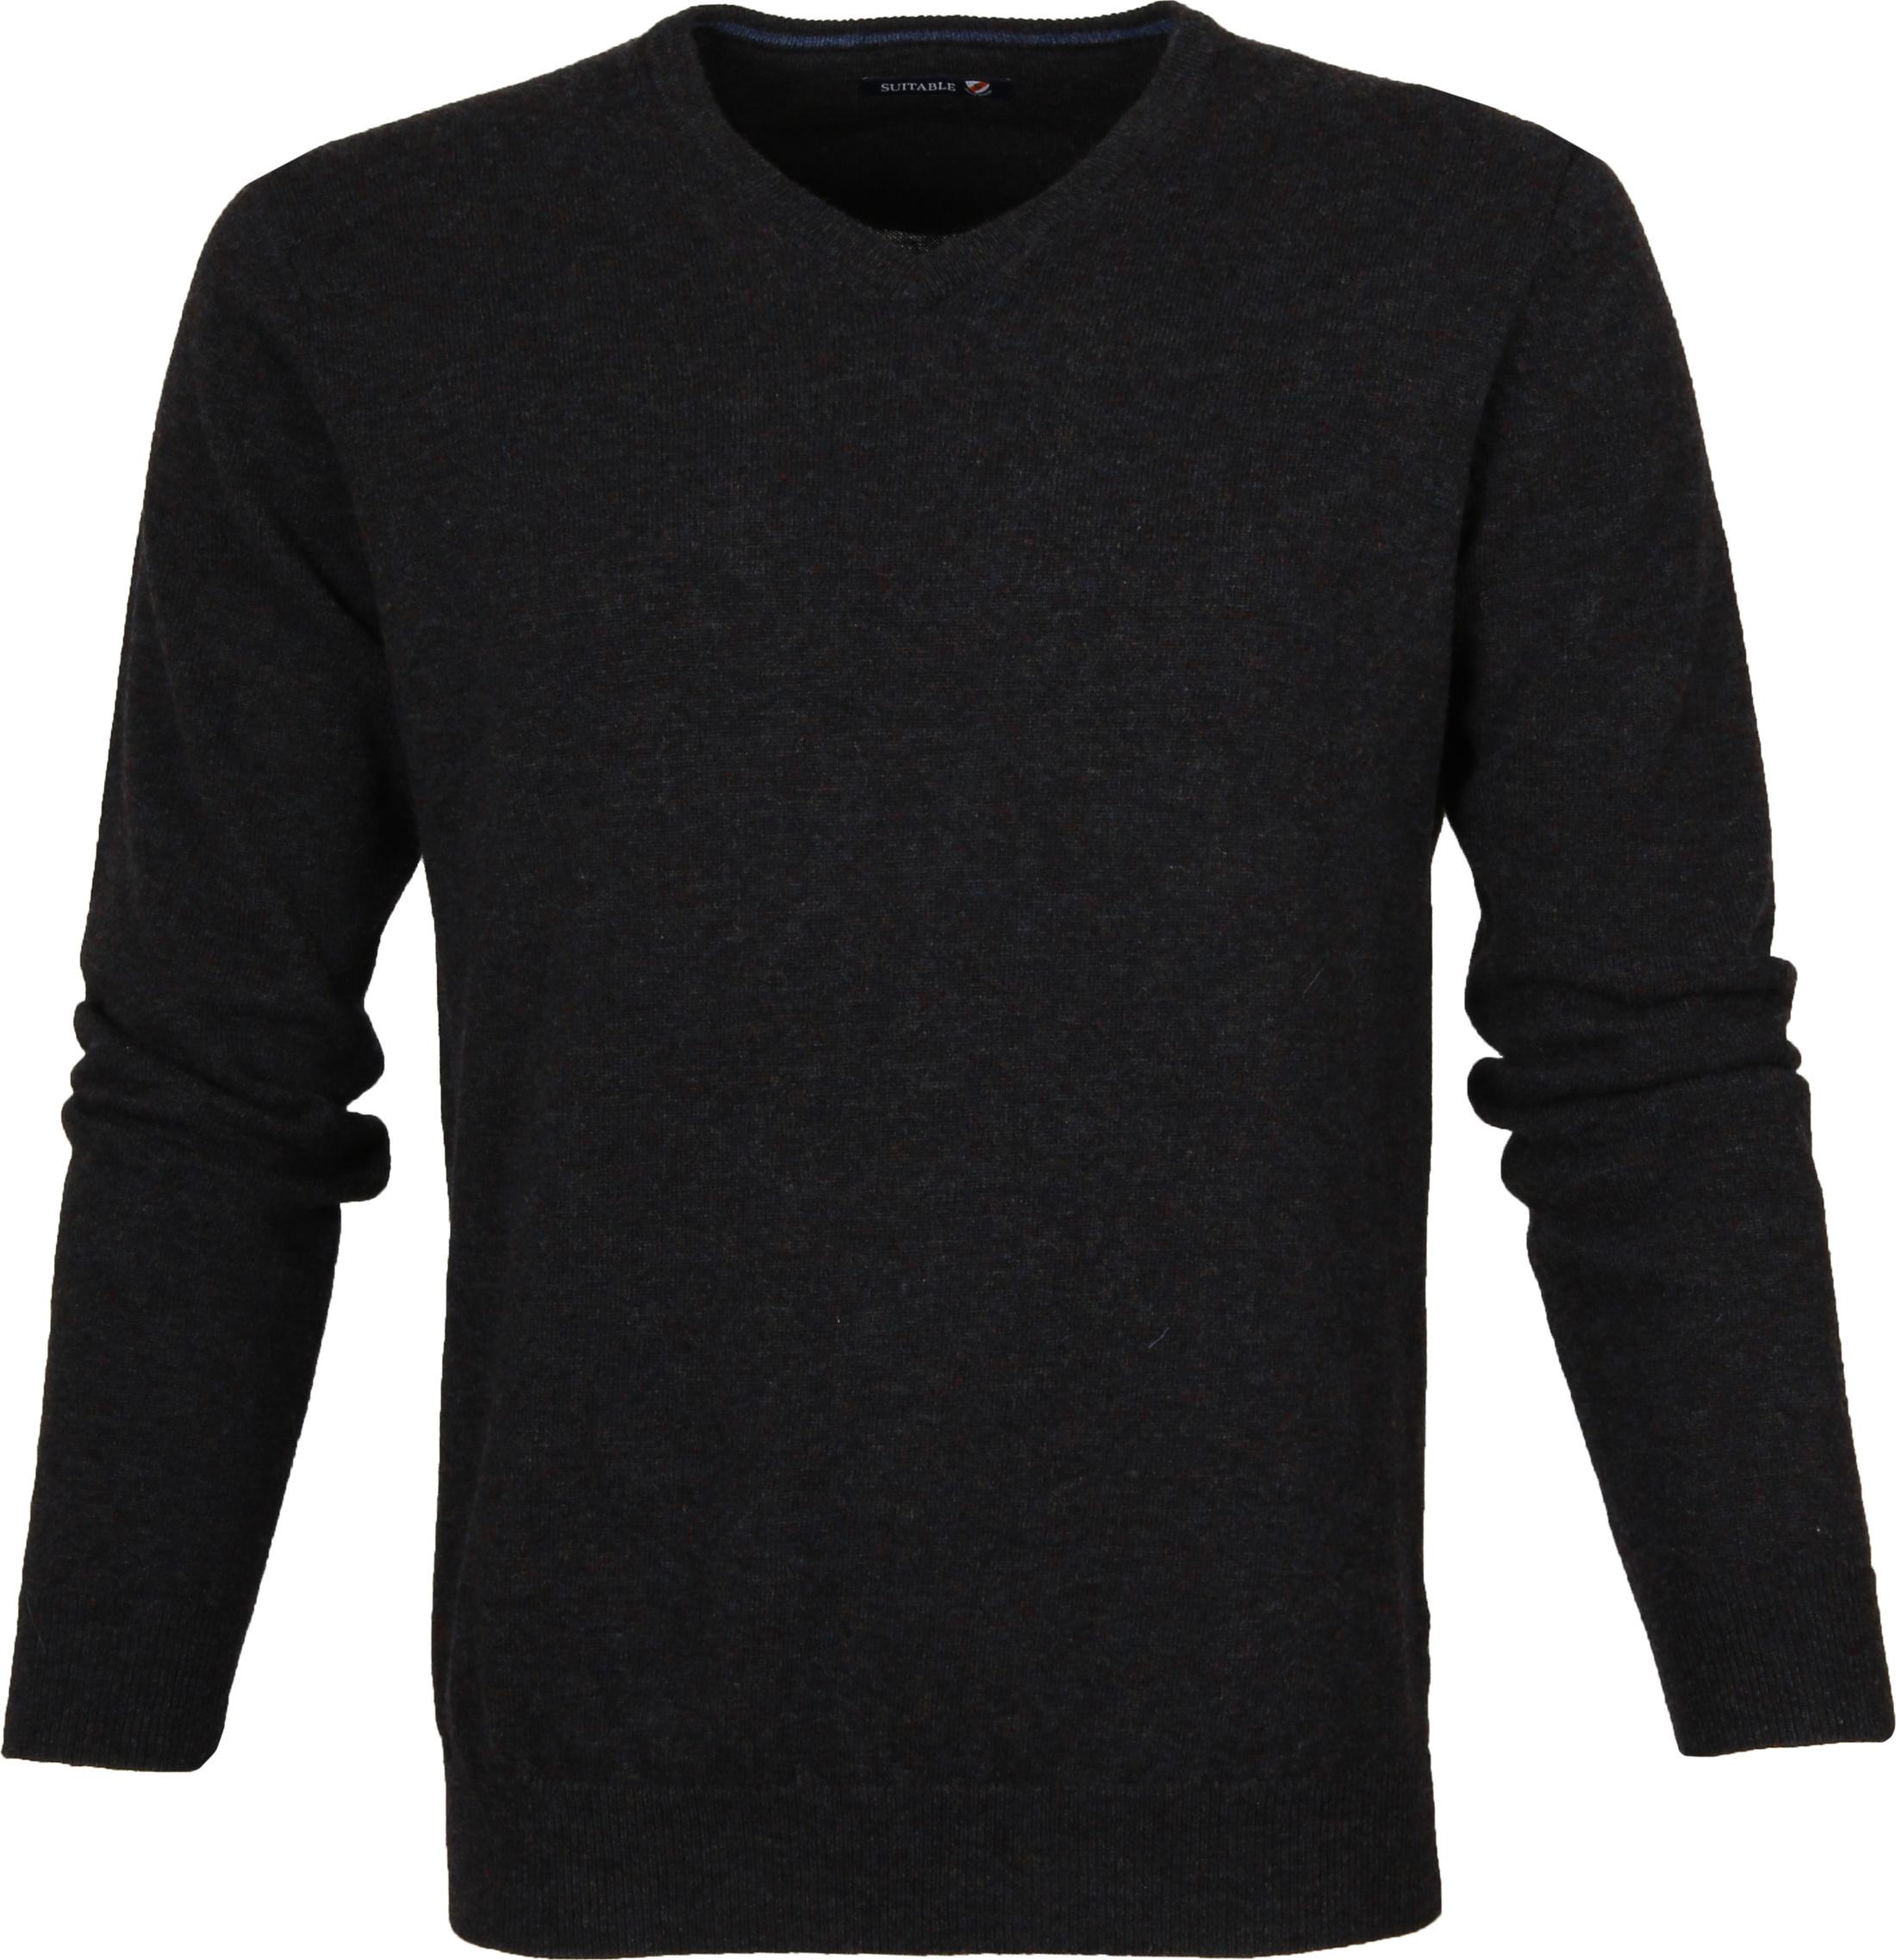 Suitable Pullover Lammwolle V-Ausschnitt Anthrazit foto 0